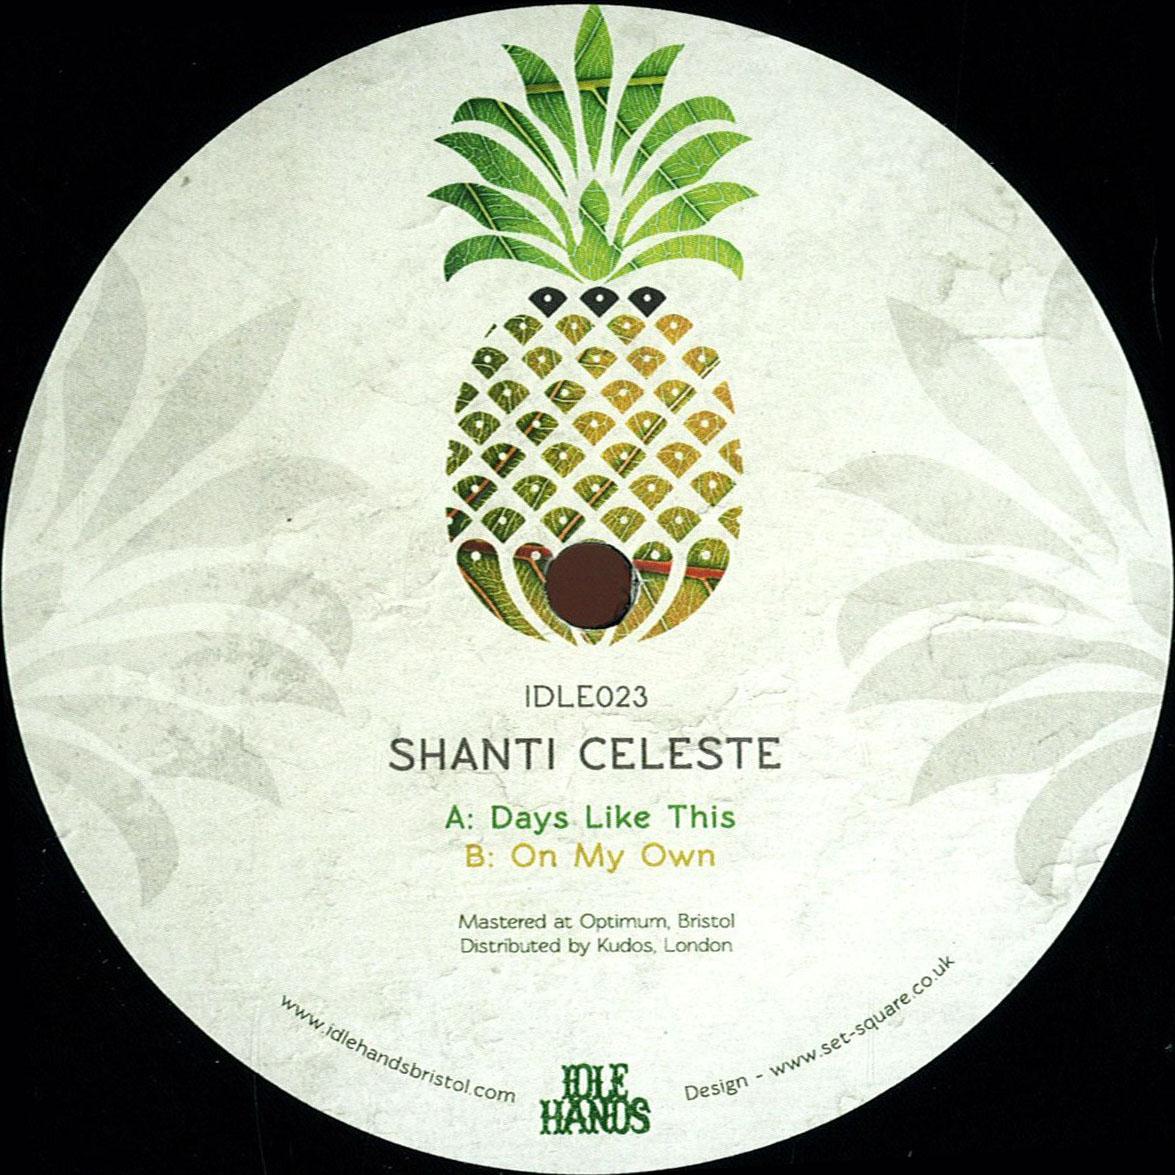 Shanti Celeste - Days Like This [IDLE023]